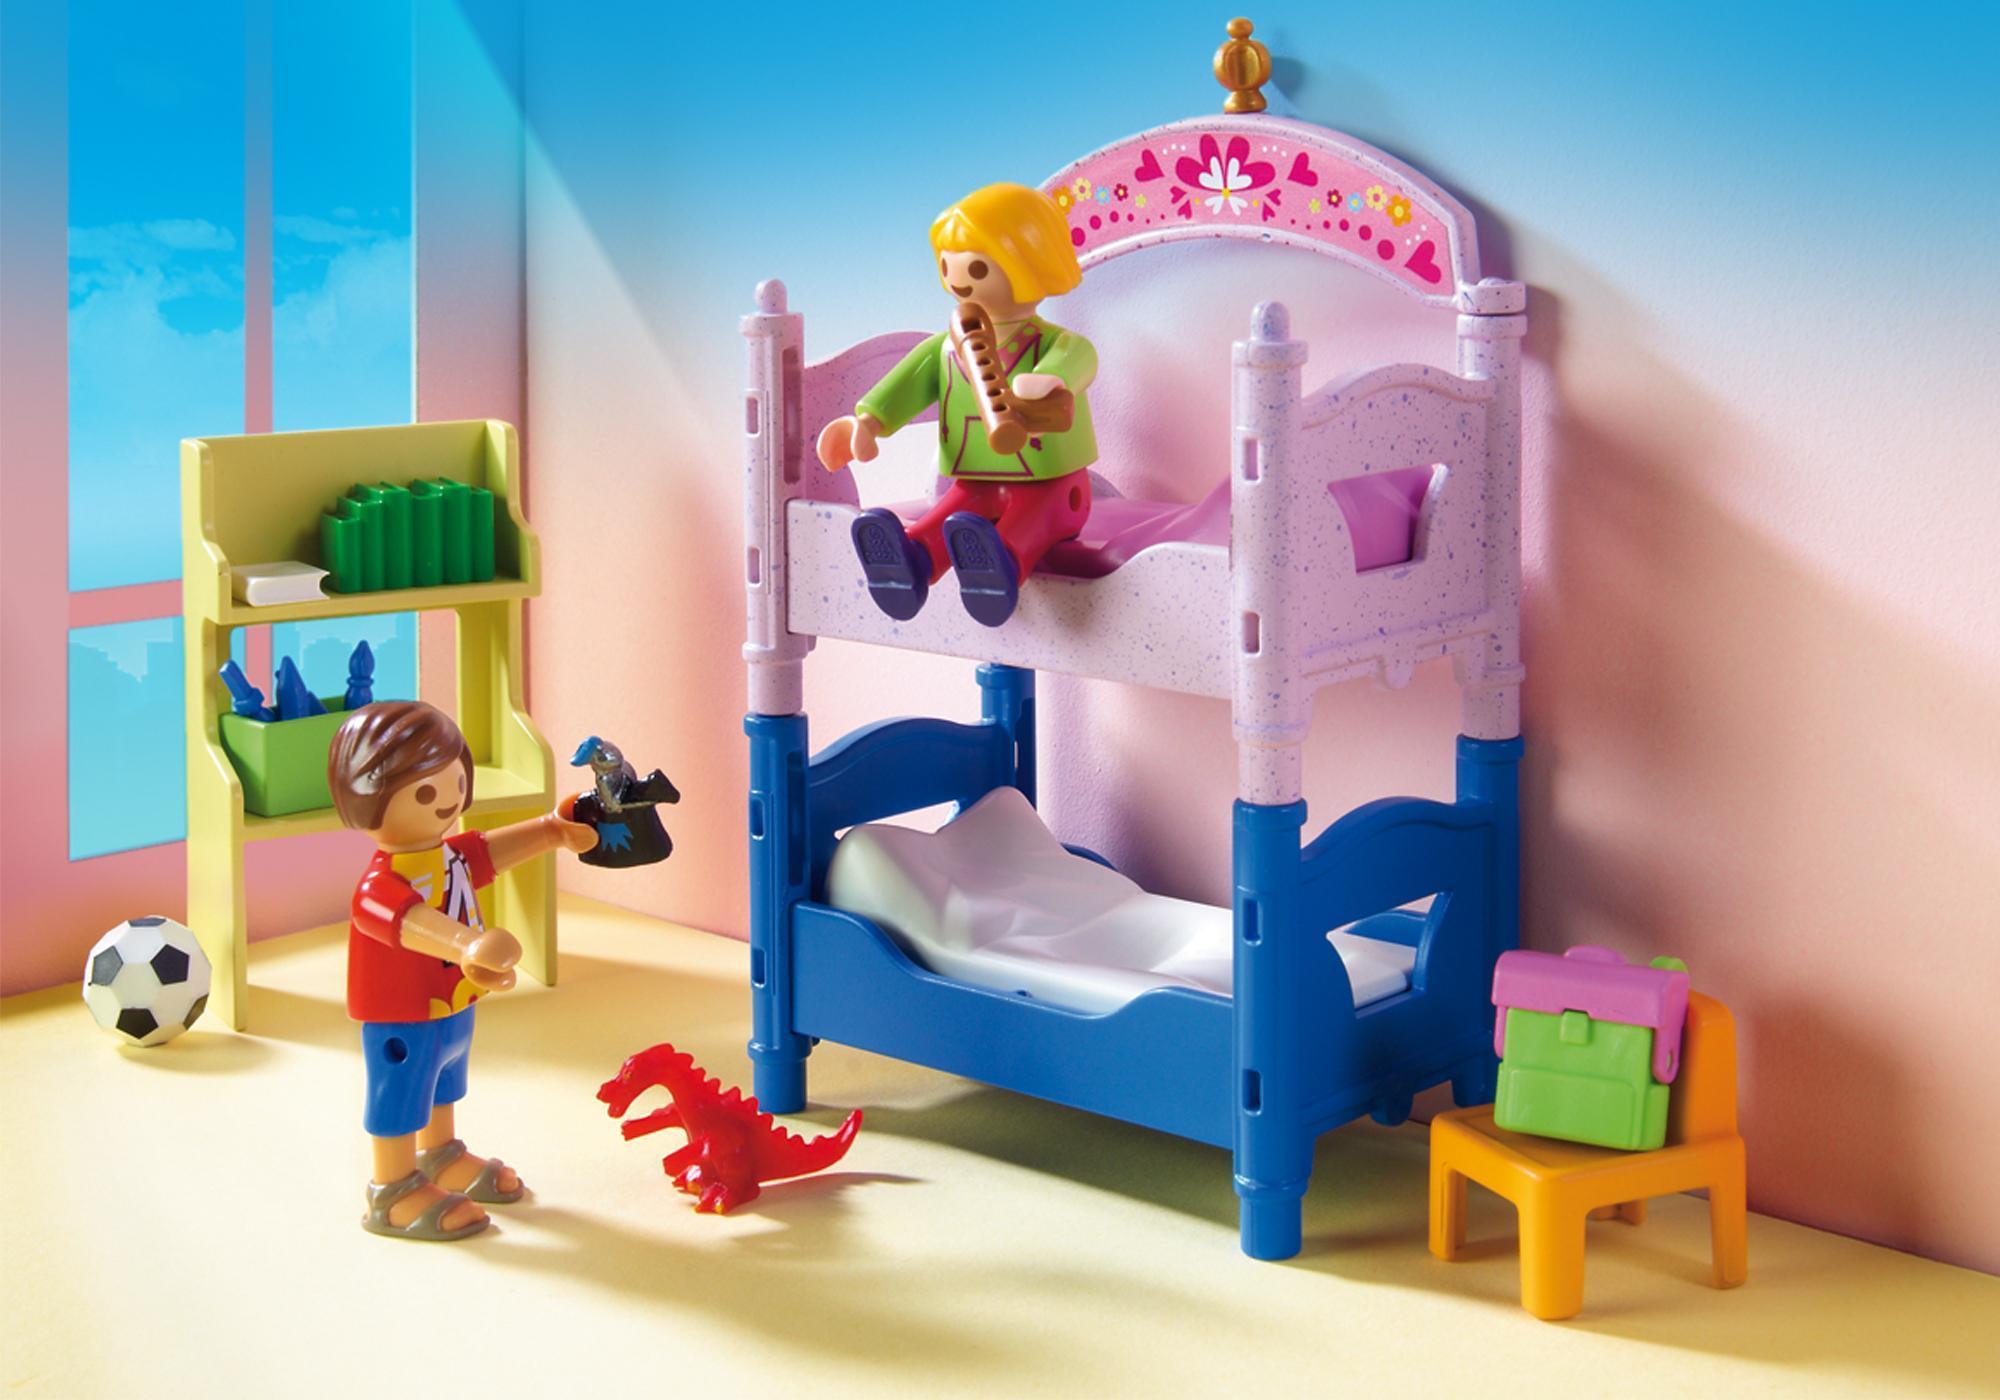 http://media.playmobil.com/i/playmobil/5306_product_extra1